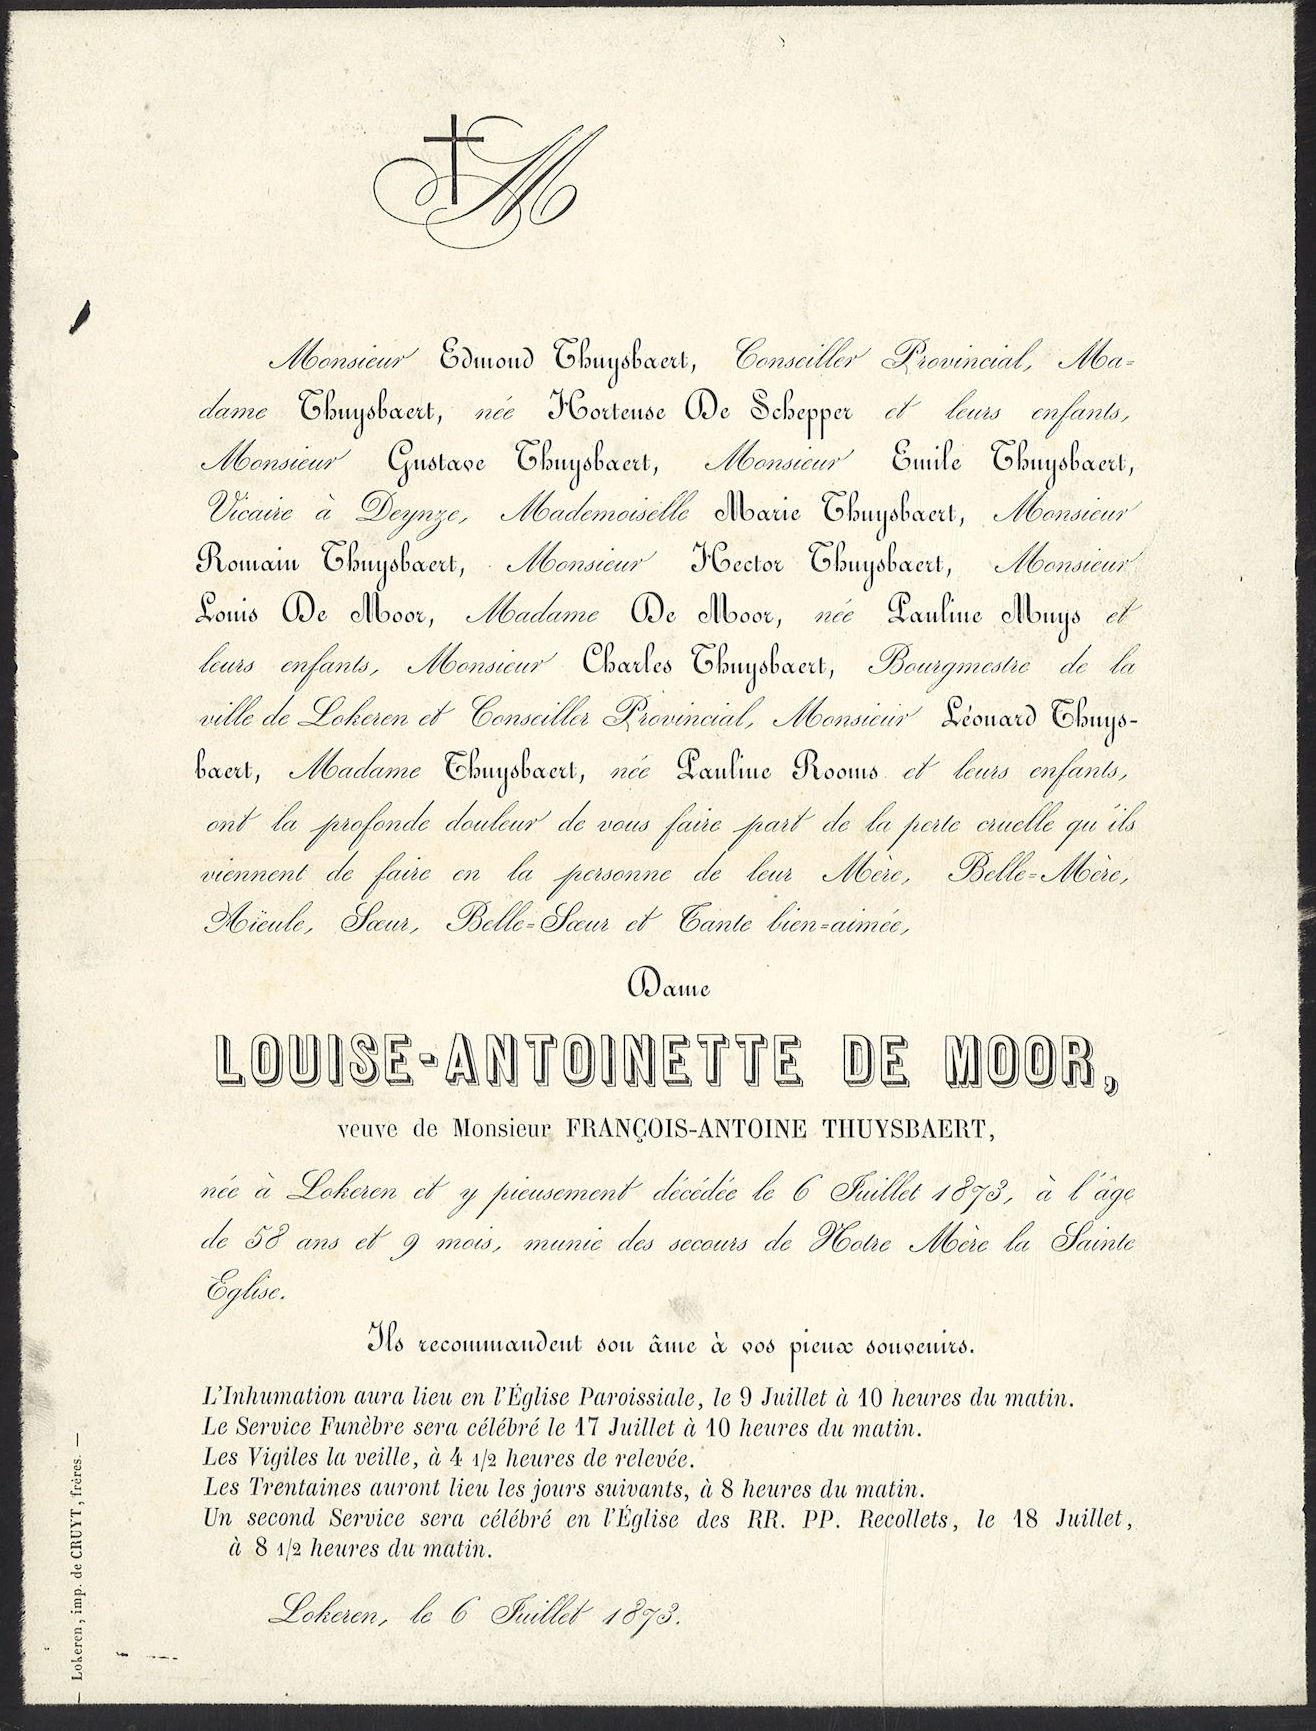 Louise-Antoinette De Moor